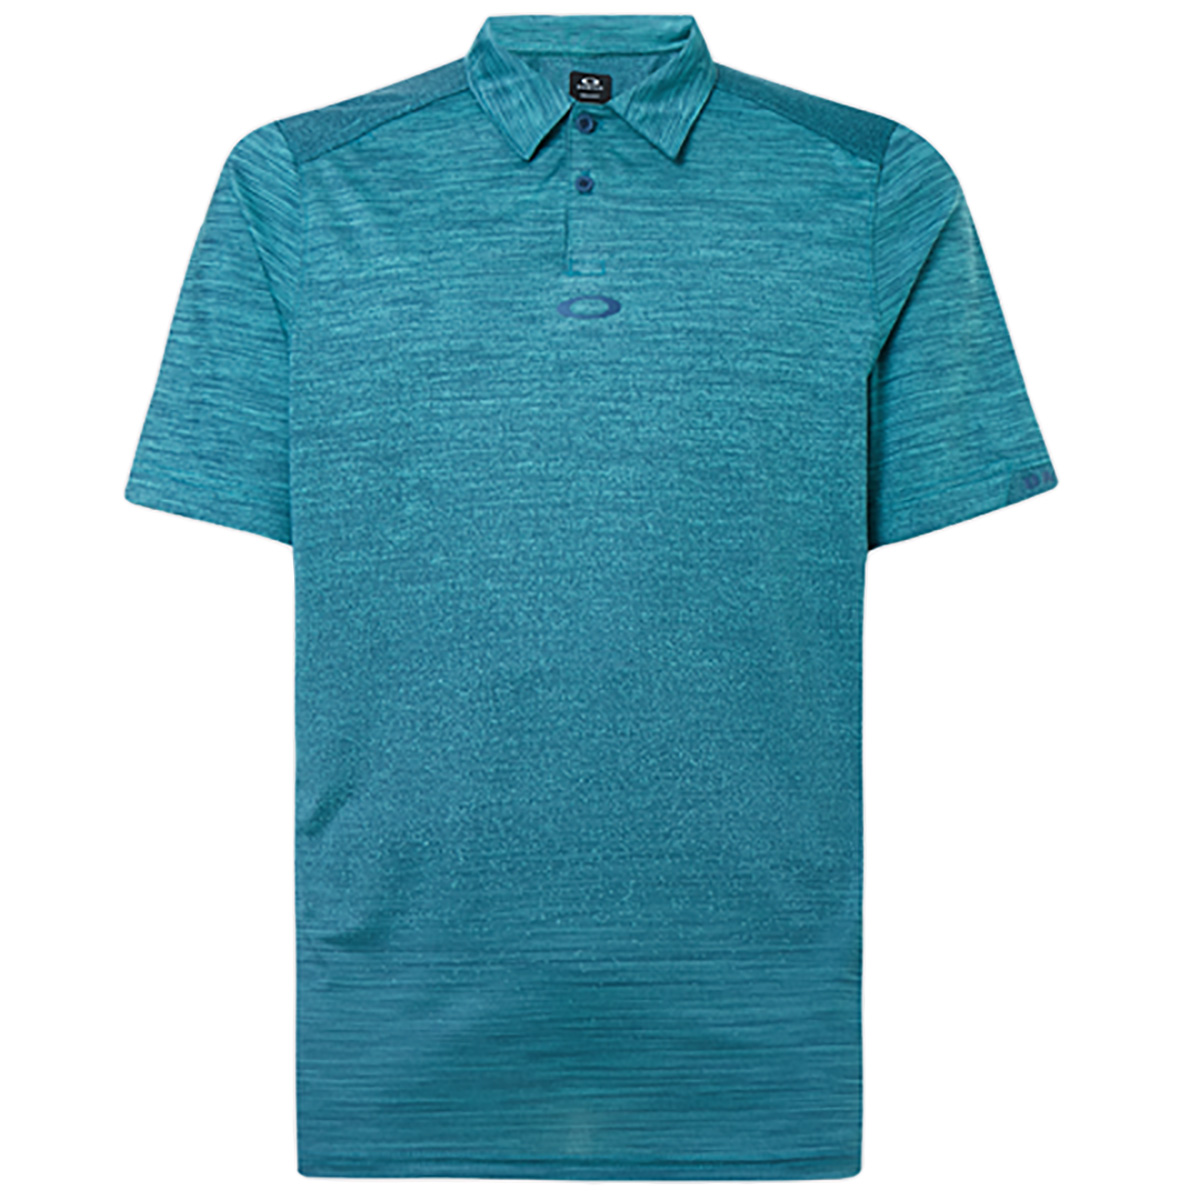 GRADIENT GRAVITY 半袖ポロシャツ 2.0